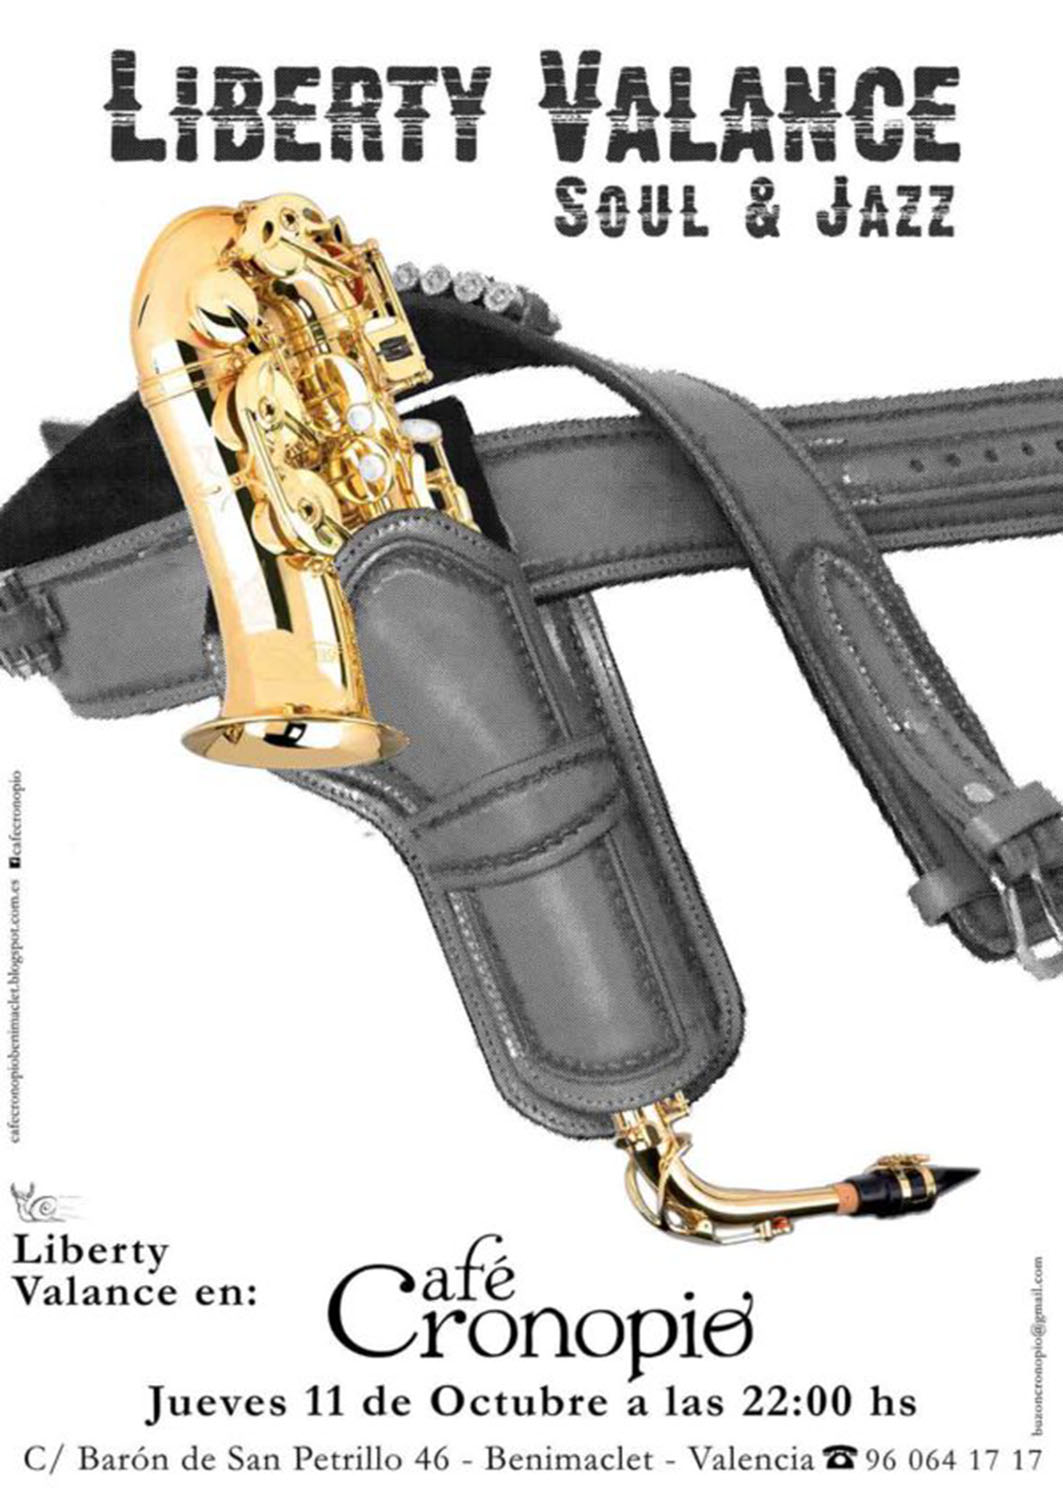 Cronopio Liberty